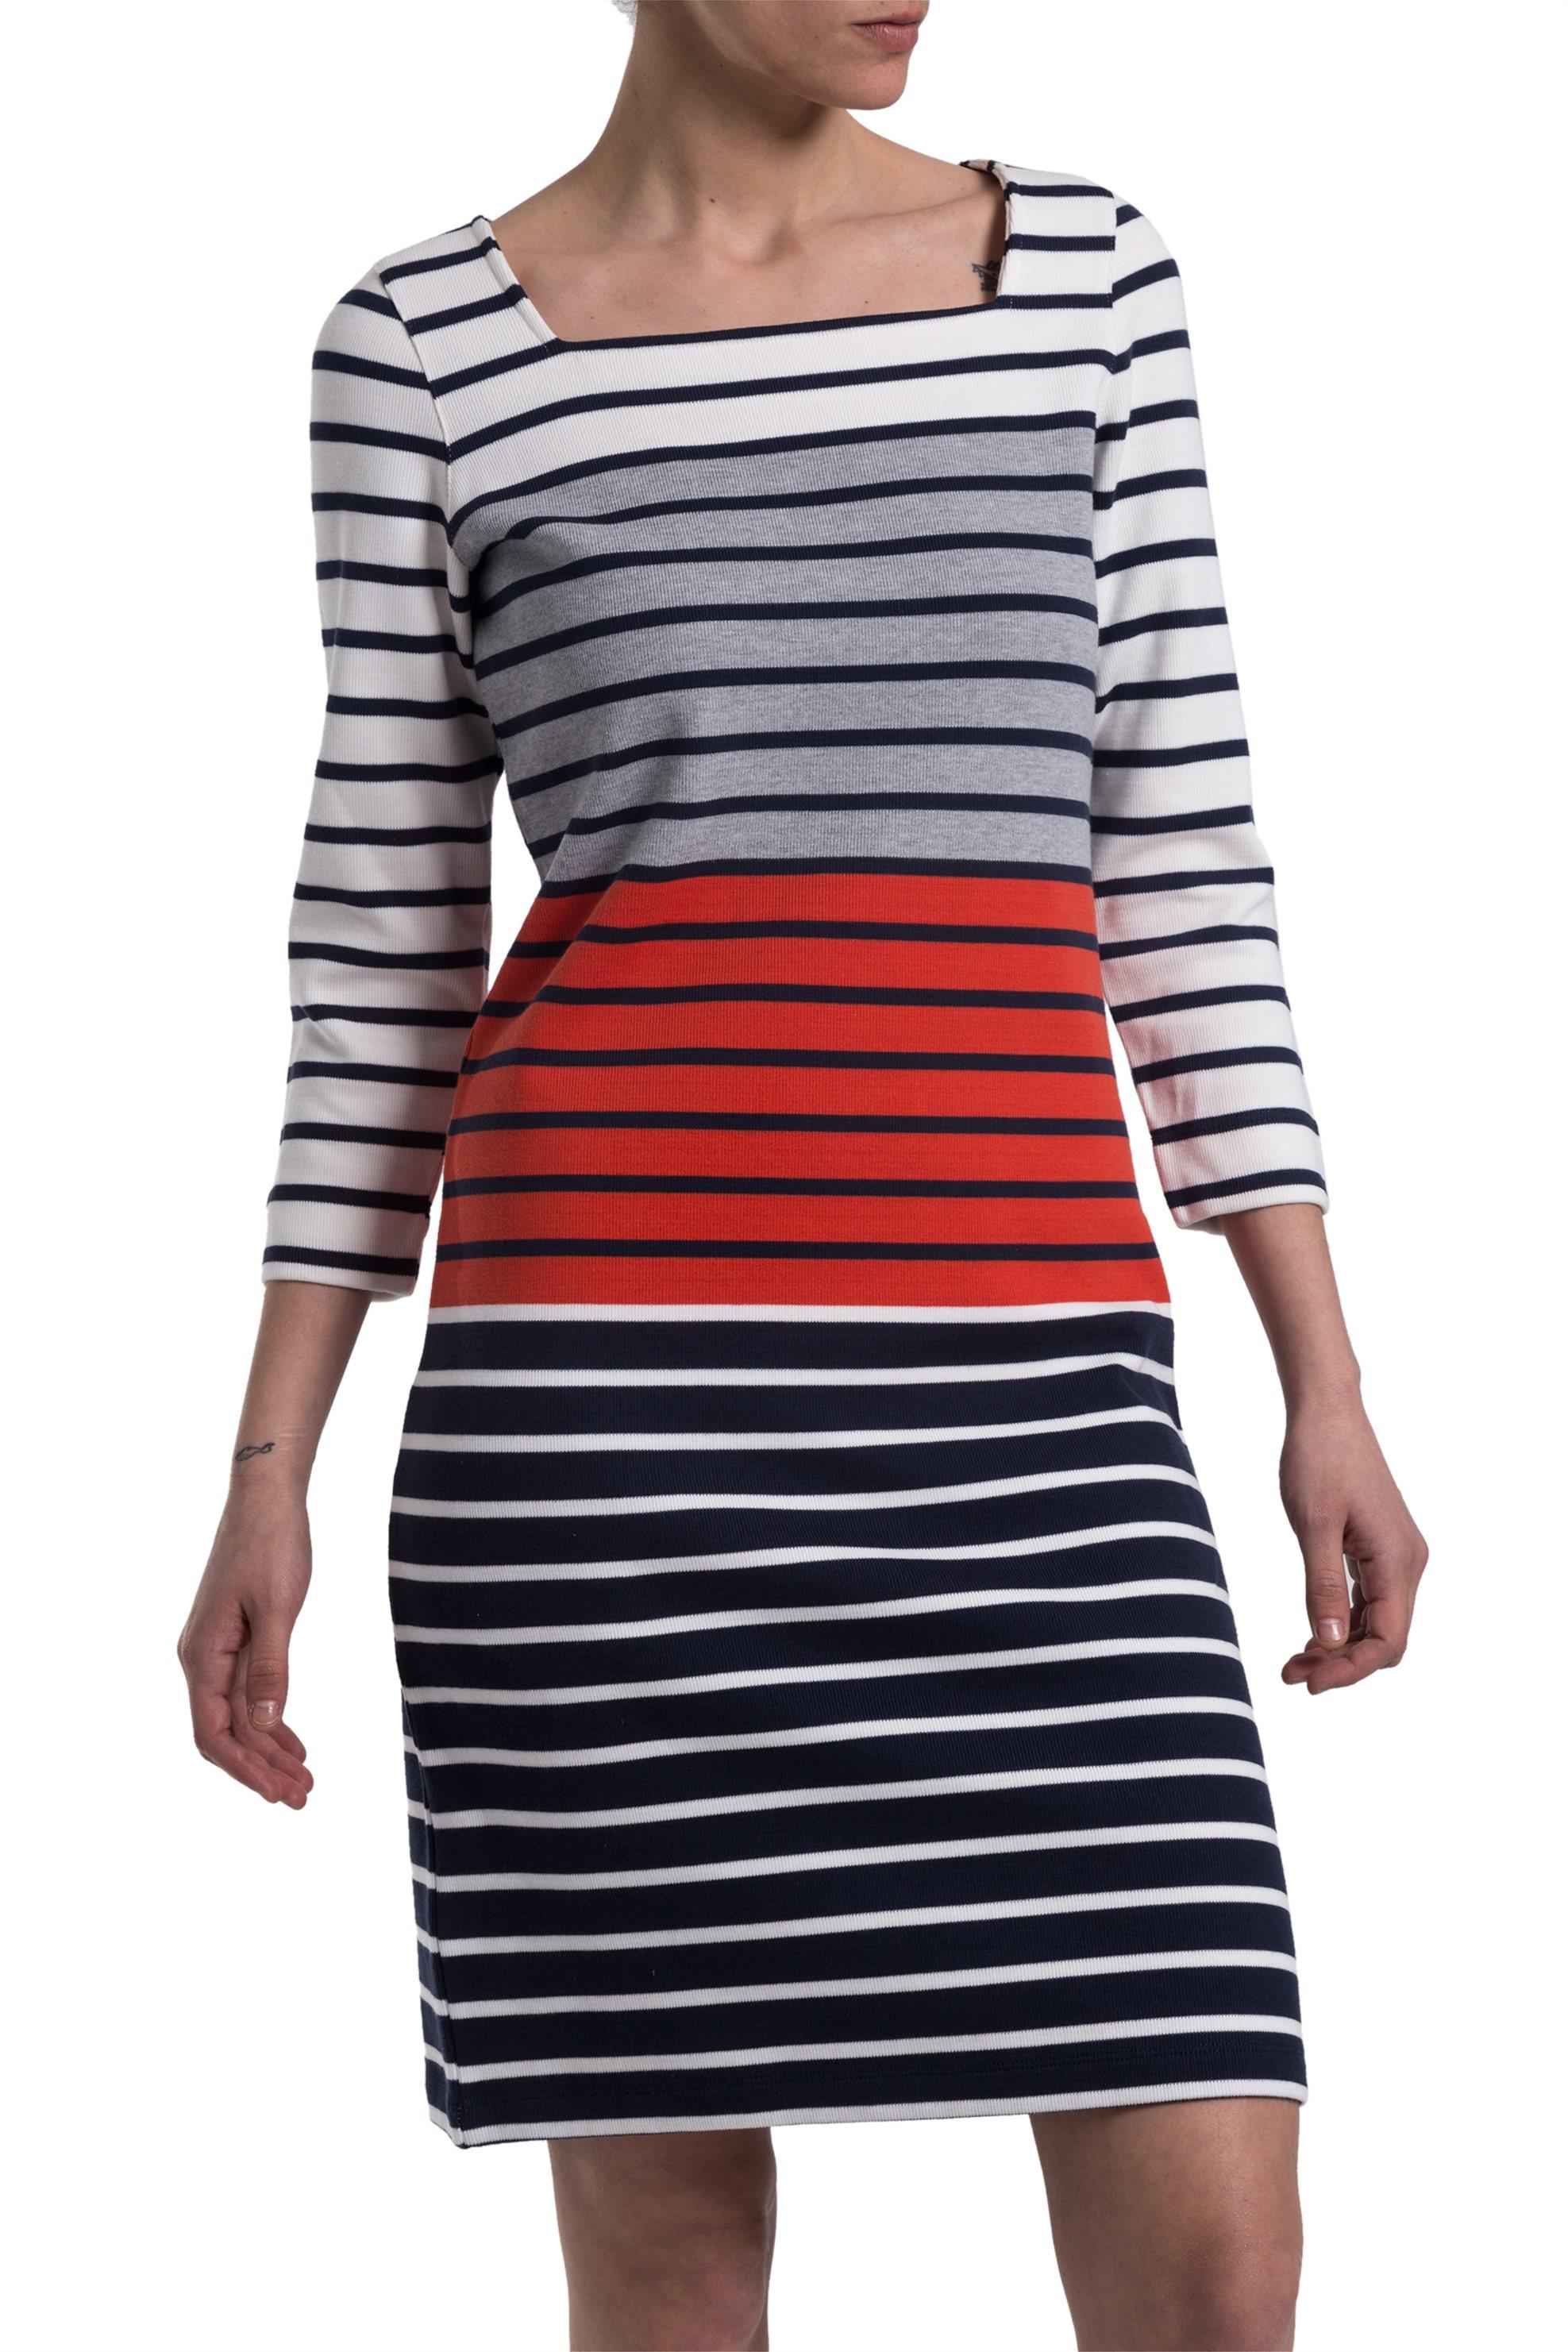 6a5fc70e466c Γυναικεία   Ρούχα   Φορέματα   Καθημερινά   70096 NU Σπορ φόρεμα με ...